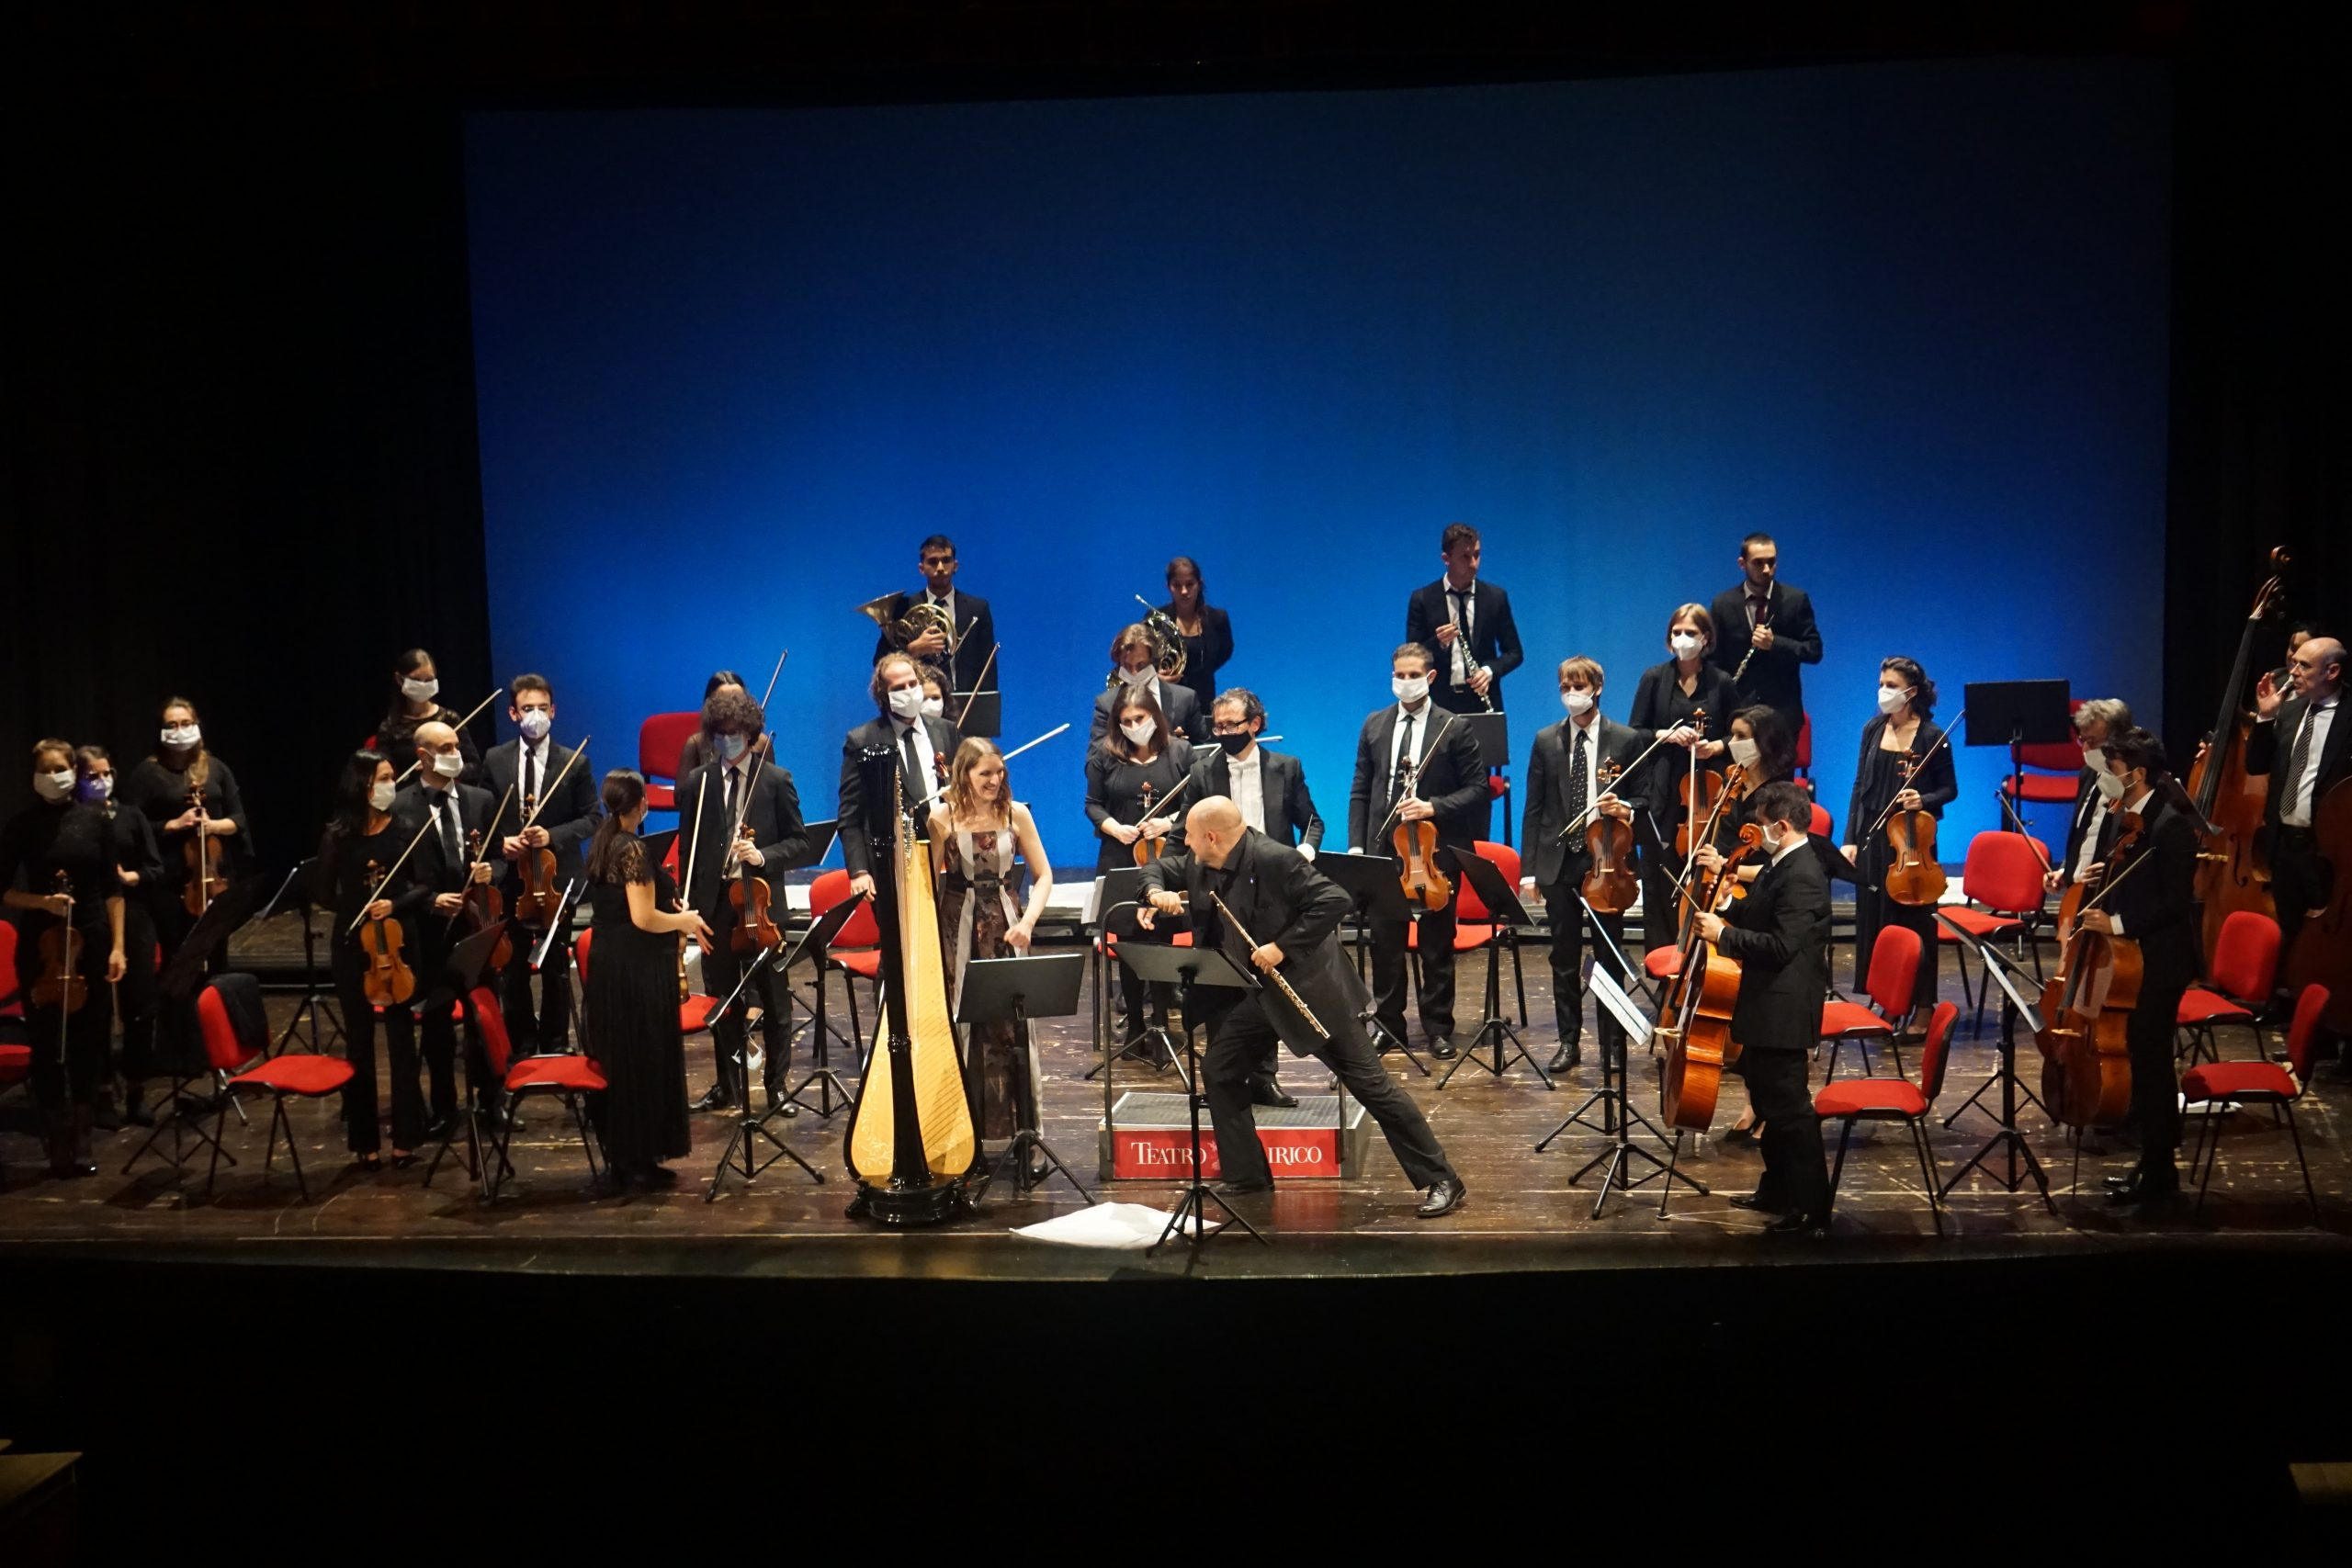 MOZART & MOZART – recupero concerto sospeso causa covid 19